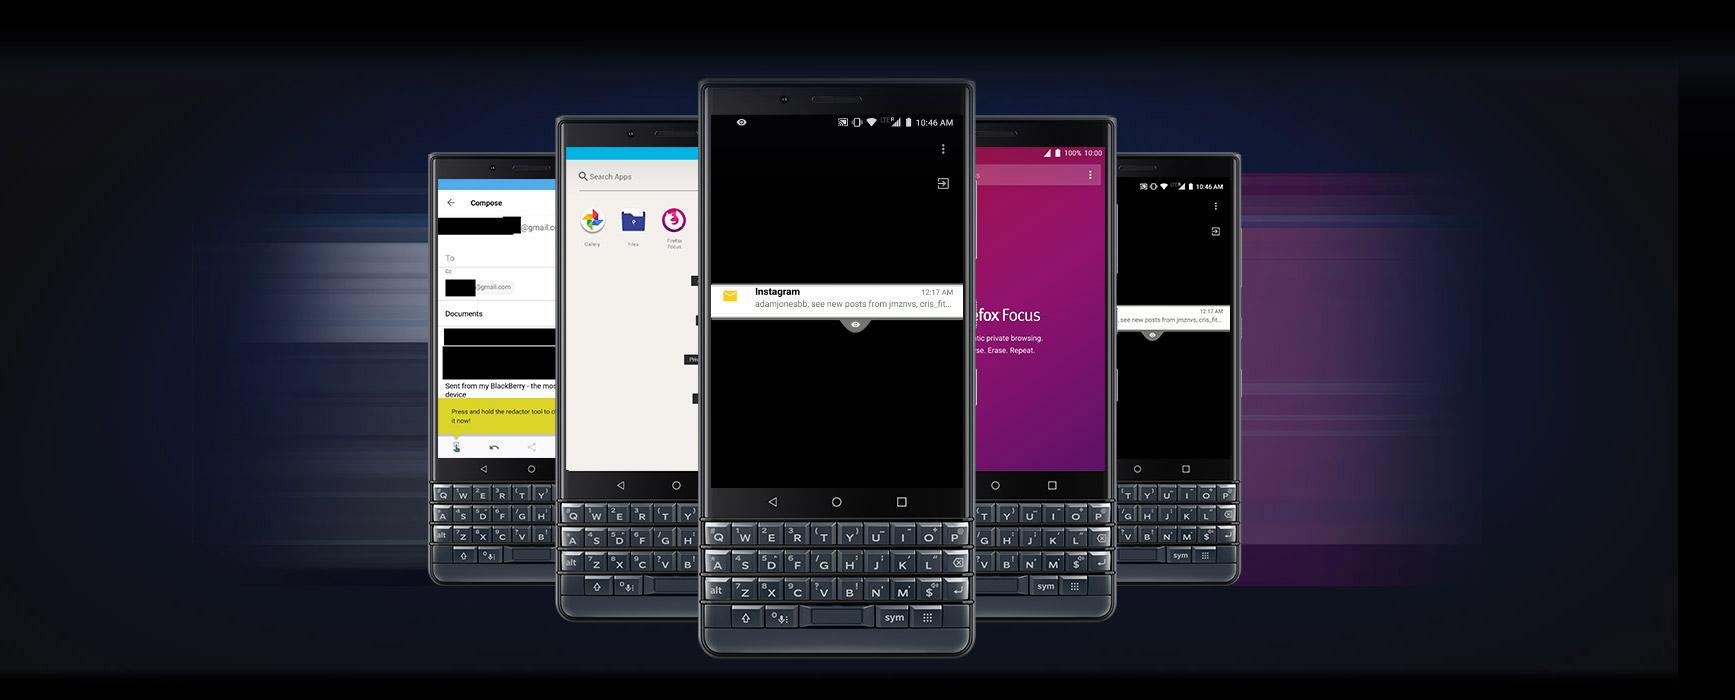 BlackBerry KEY2 LE 4G LTE Cell Phone 4 5